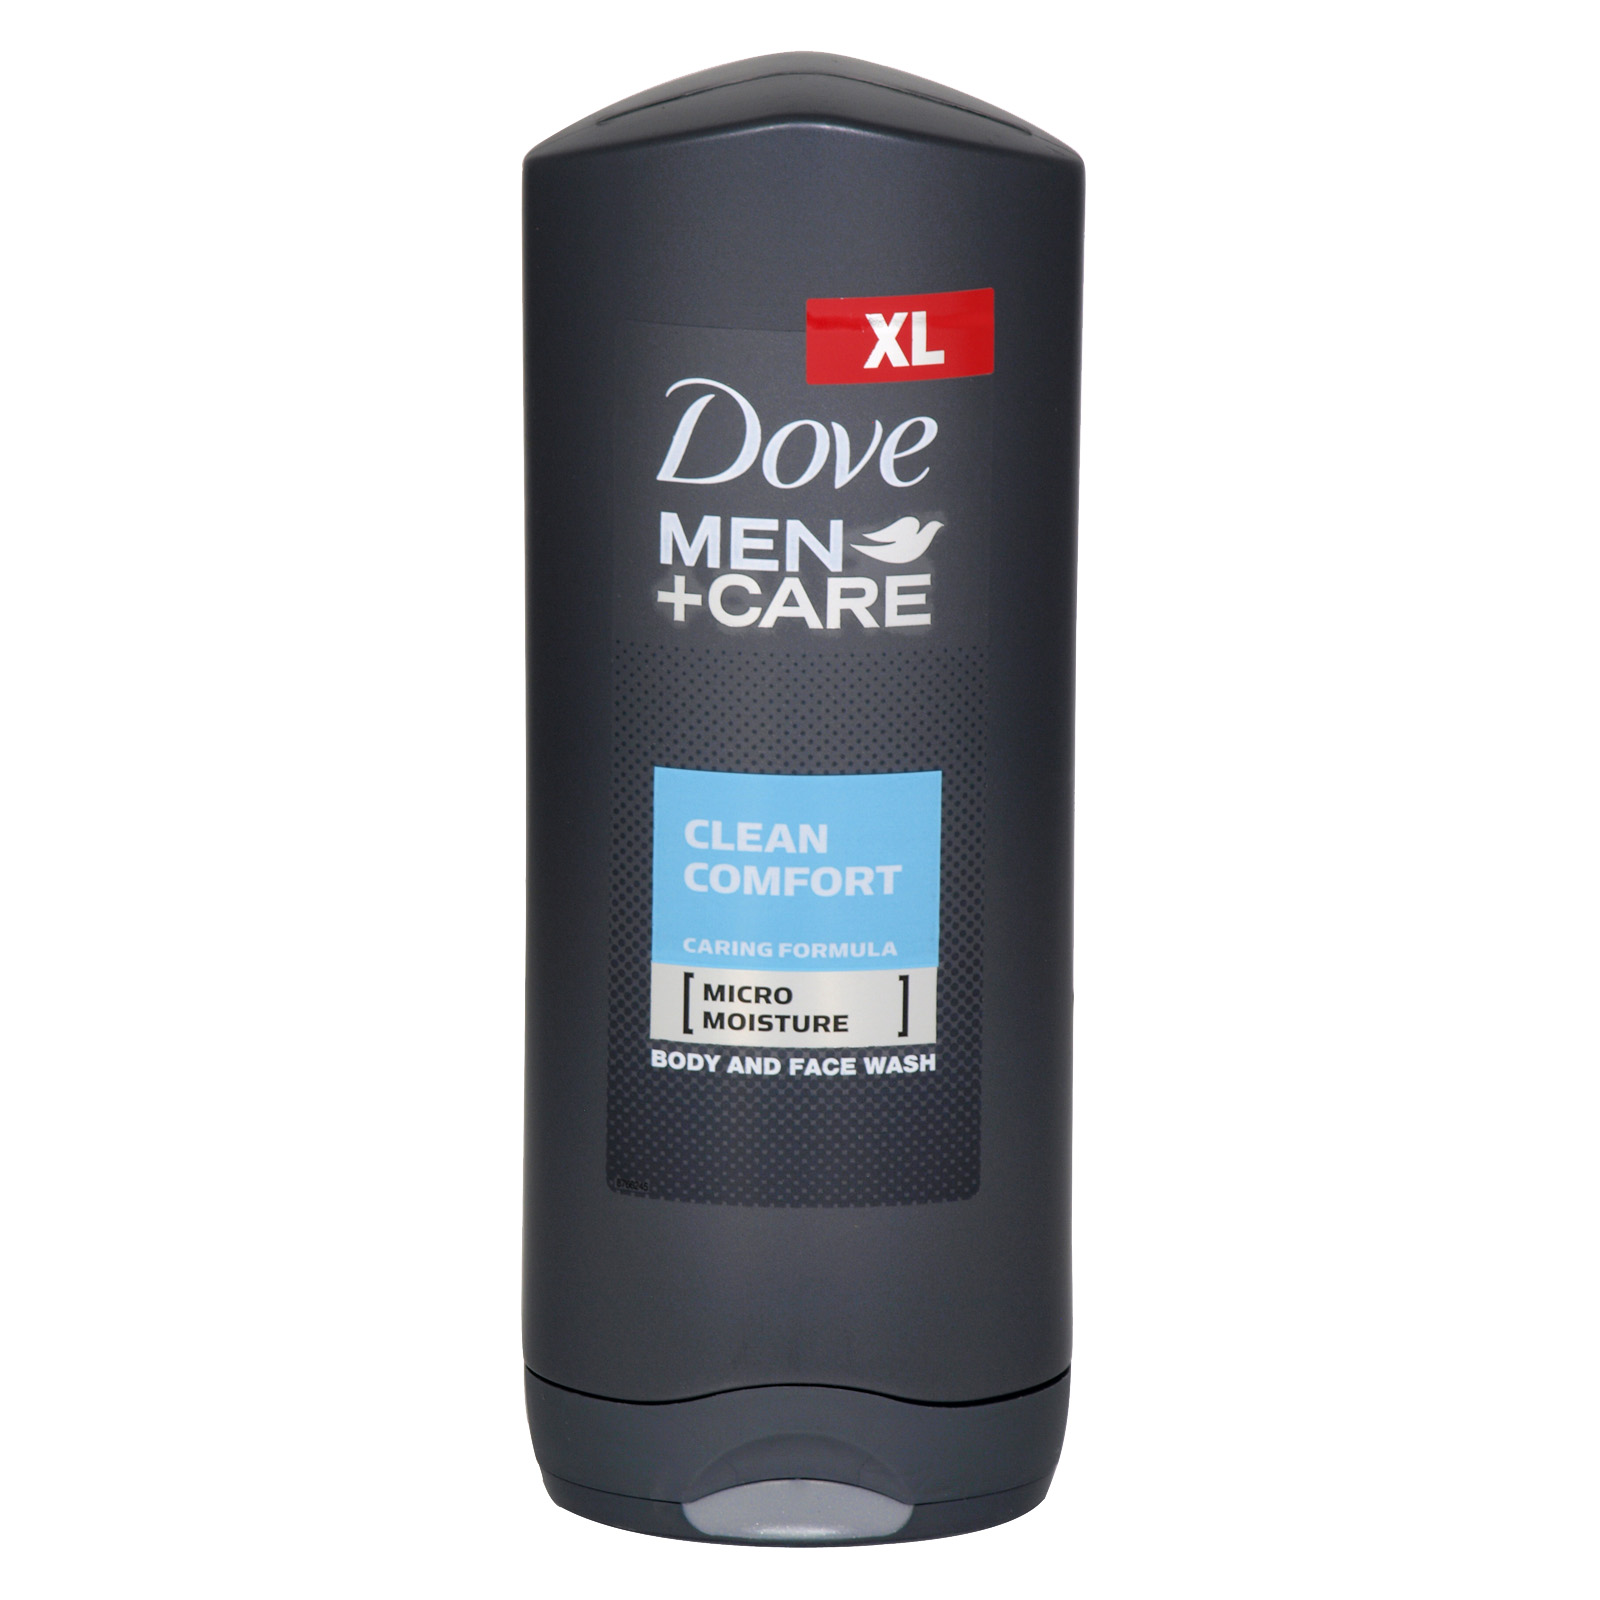 DOVE MEN+CARE 400ML FACE+BODY WASH CLEAN COMFORT X 6